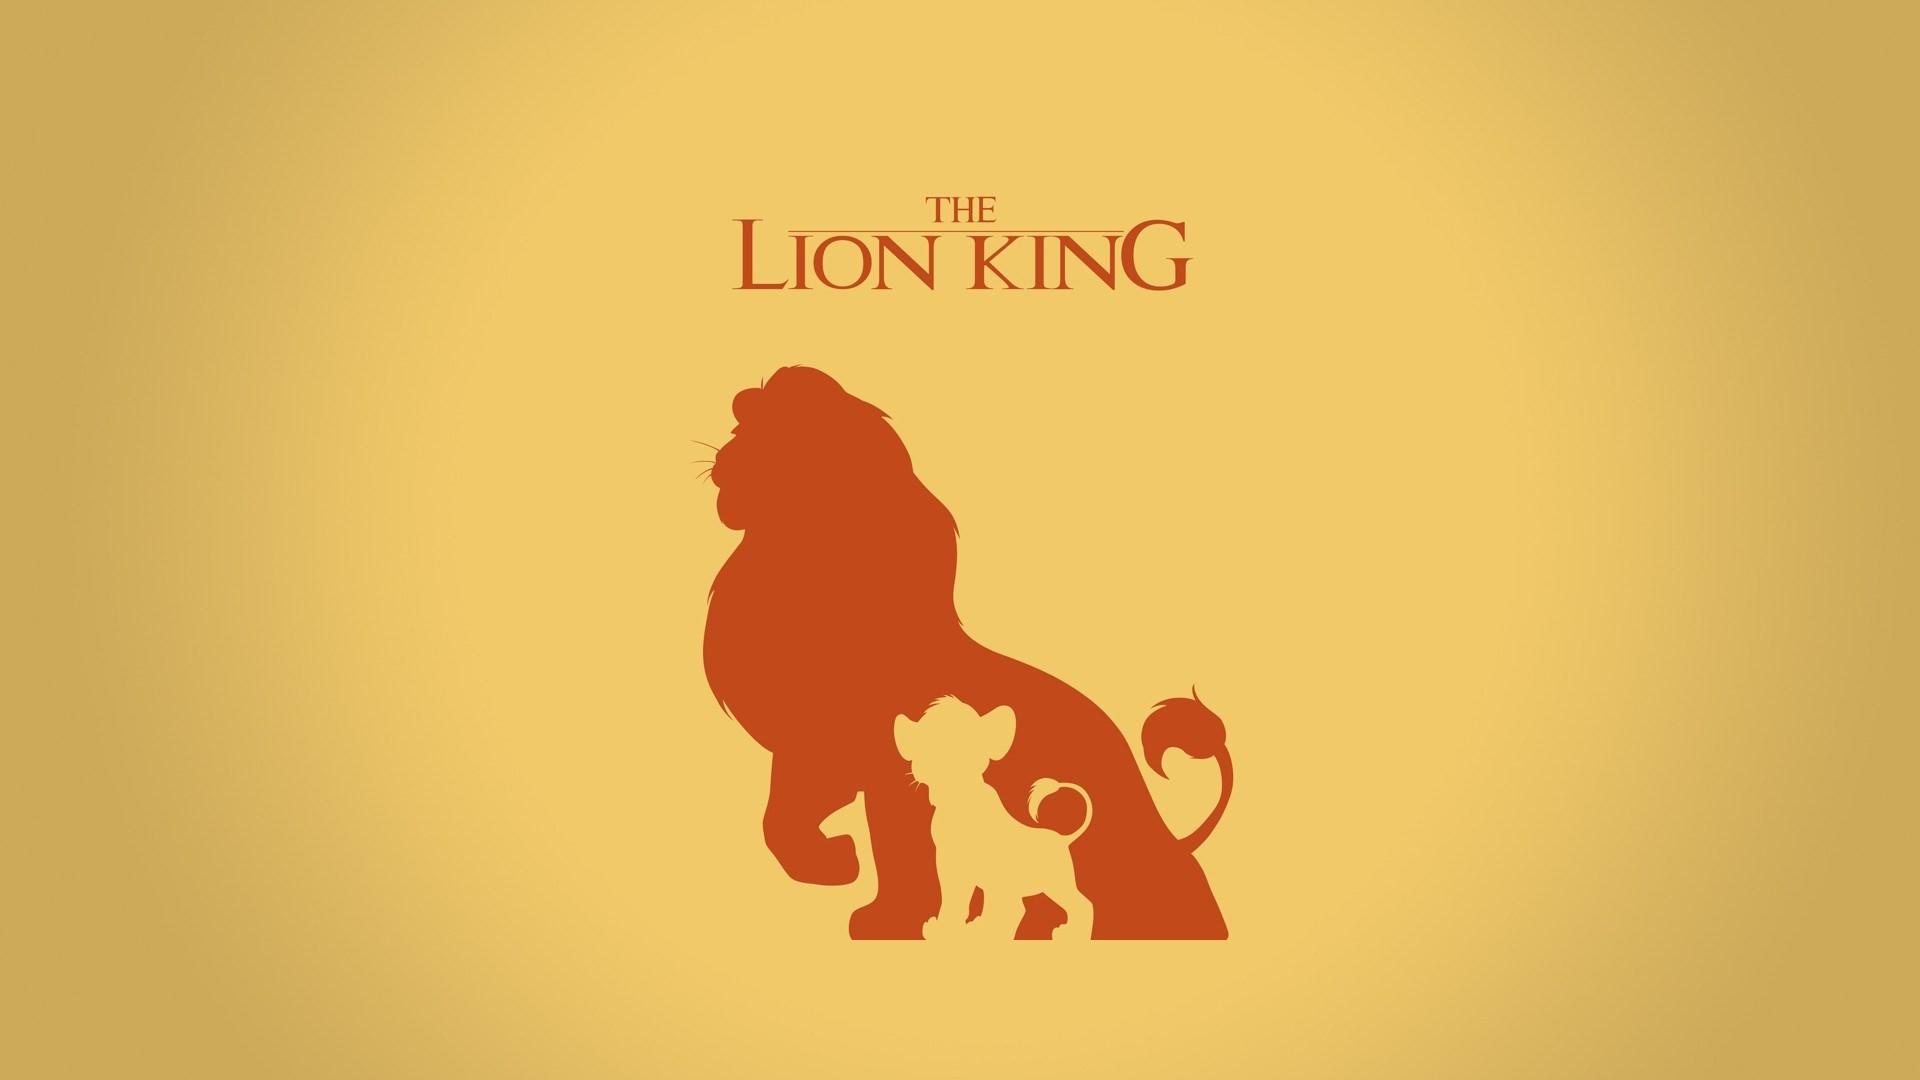 Lion King – The Lion King Wallpaper (37324599) – Fanpop